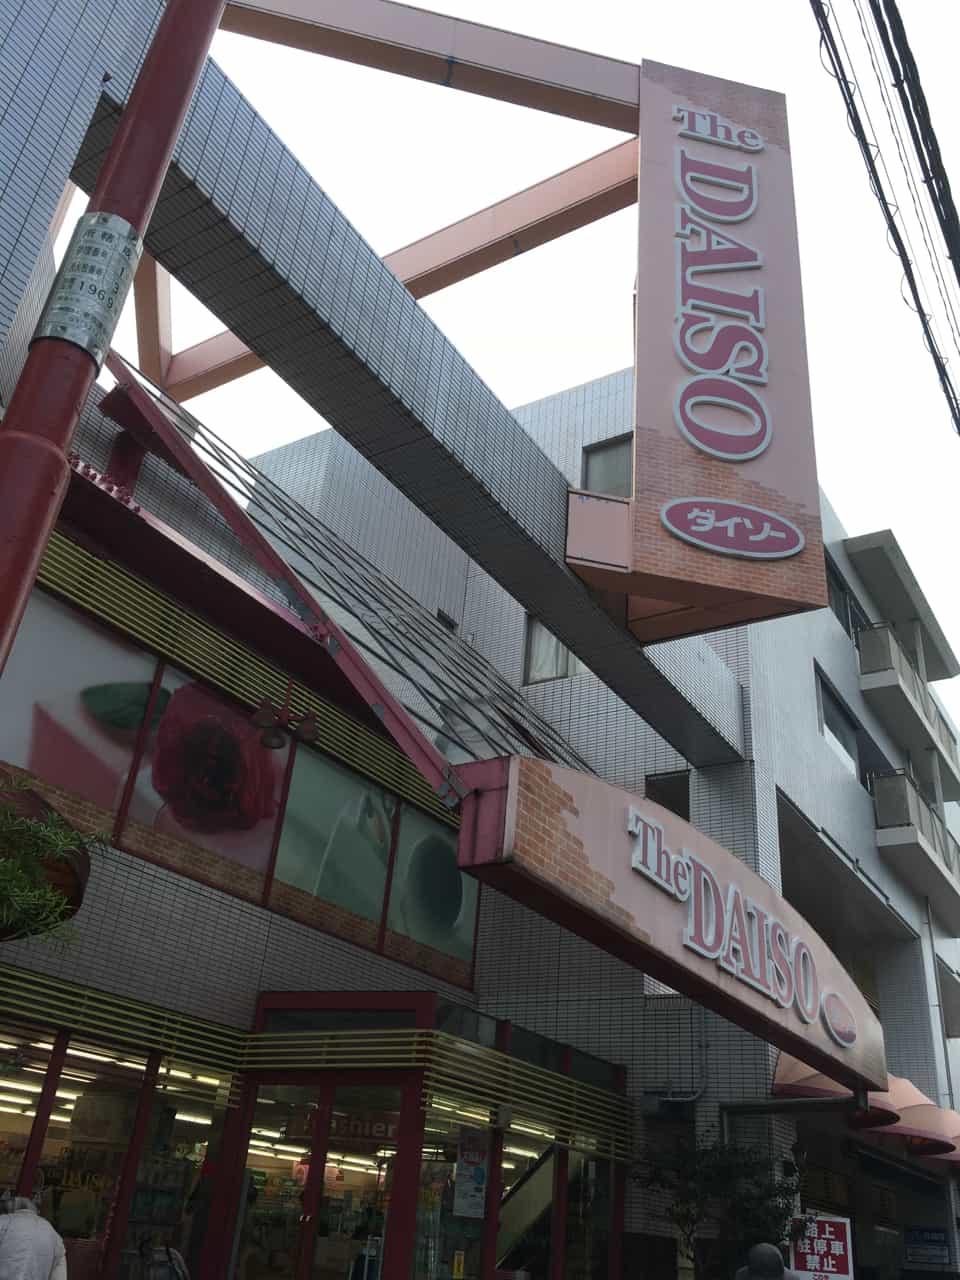 100 Yen-Shops in Japan: DAISO, Can Do, Seria und Co.